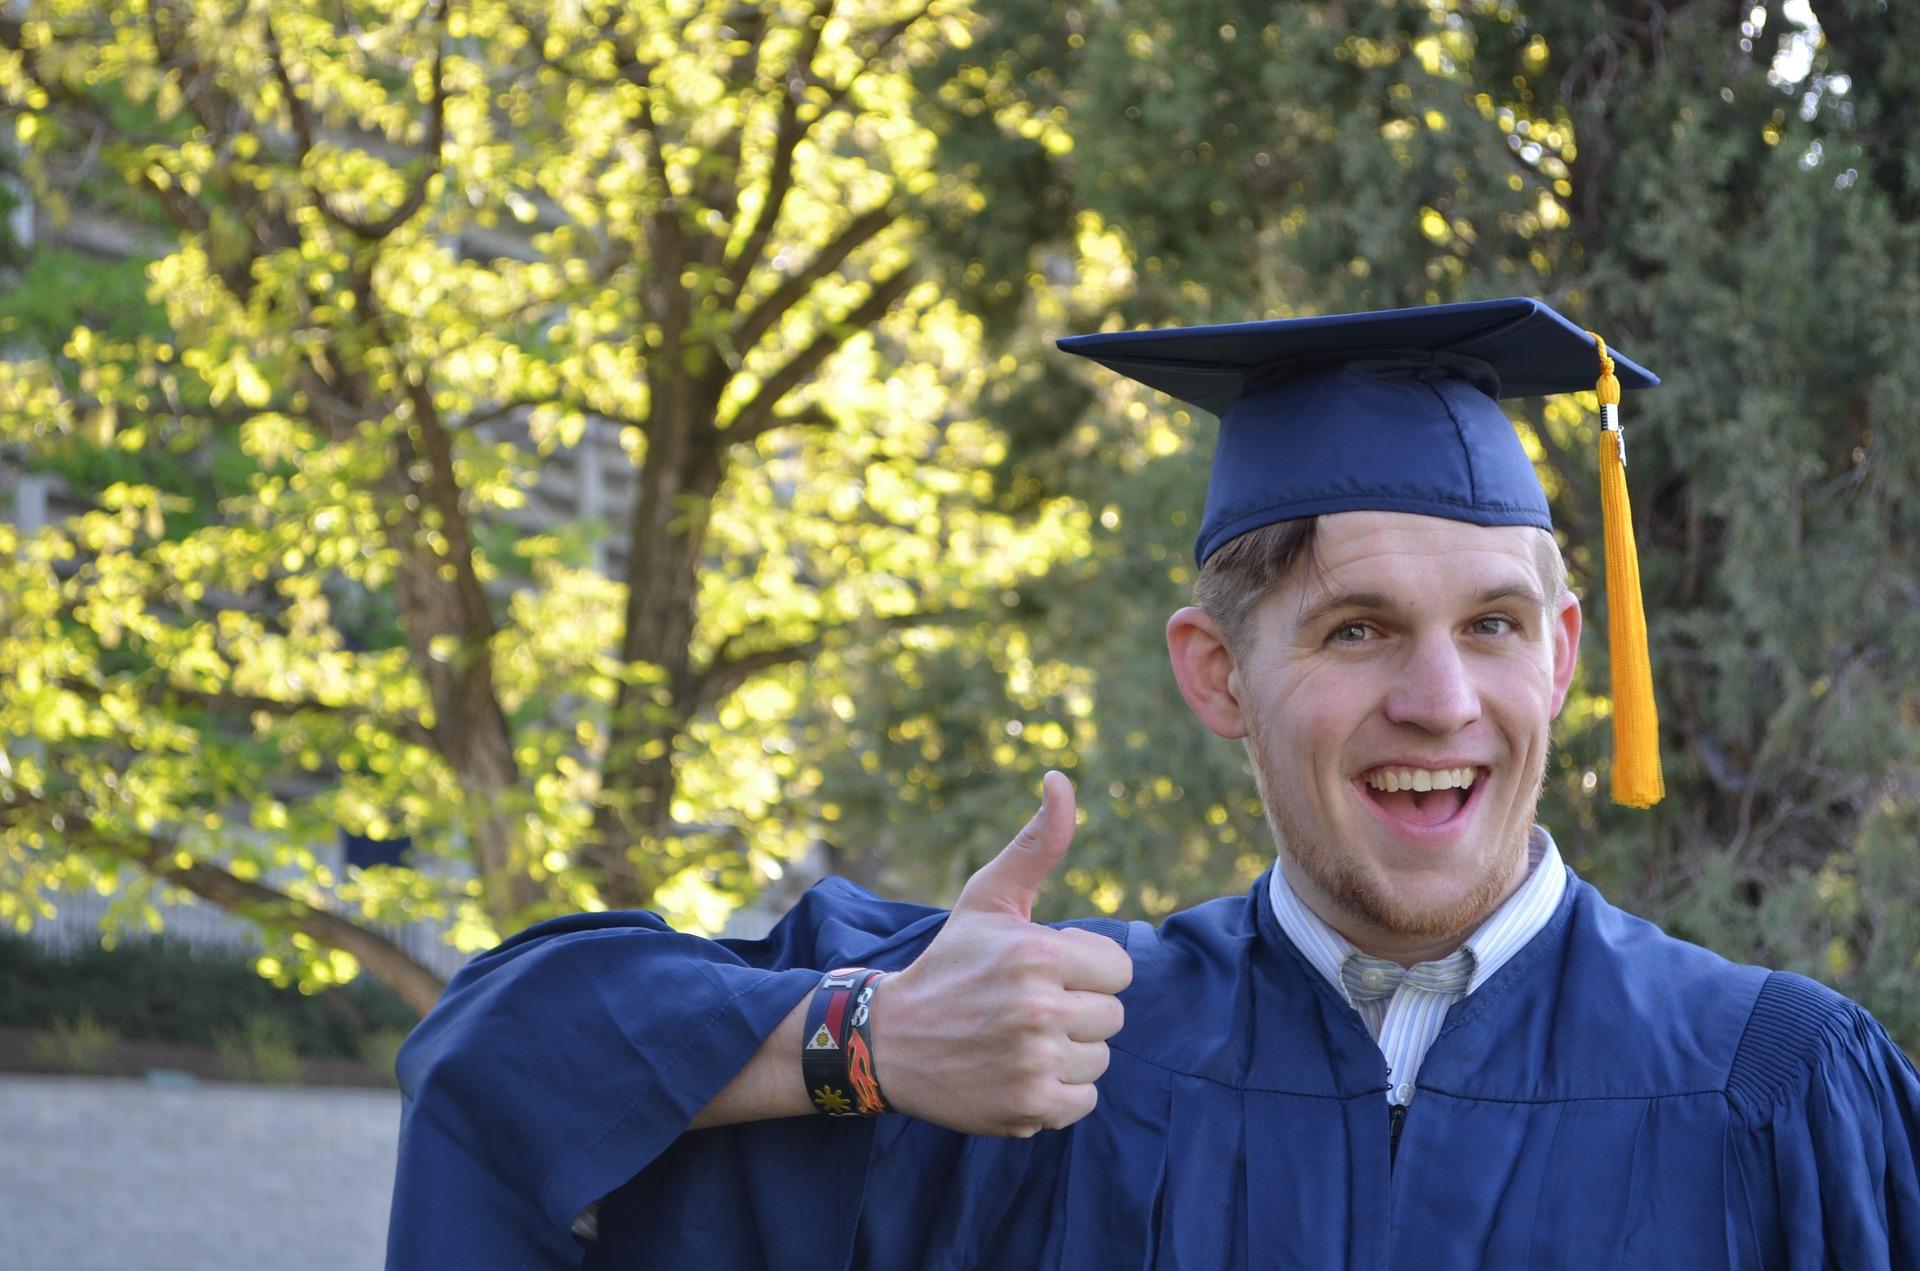 Graduation 879941 1920